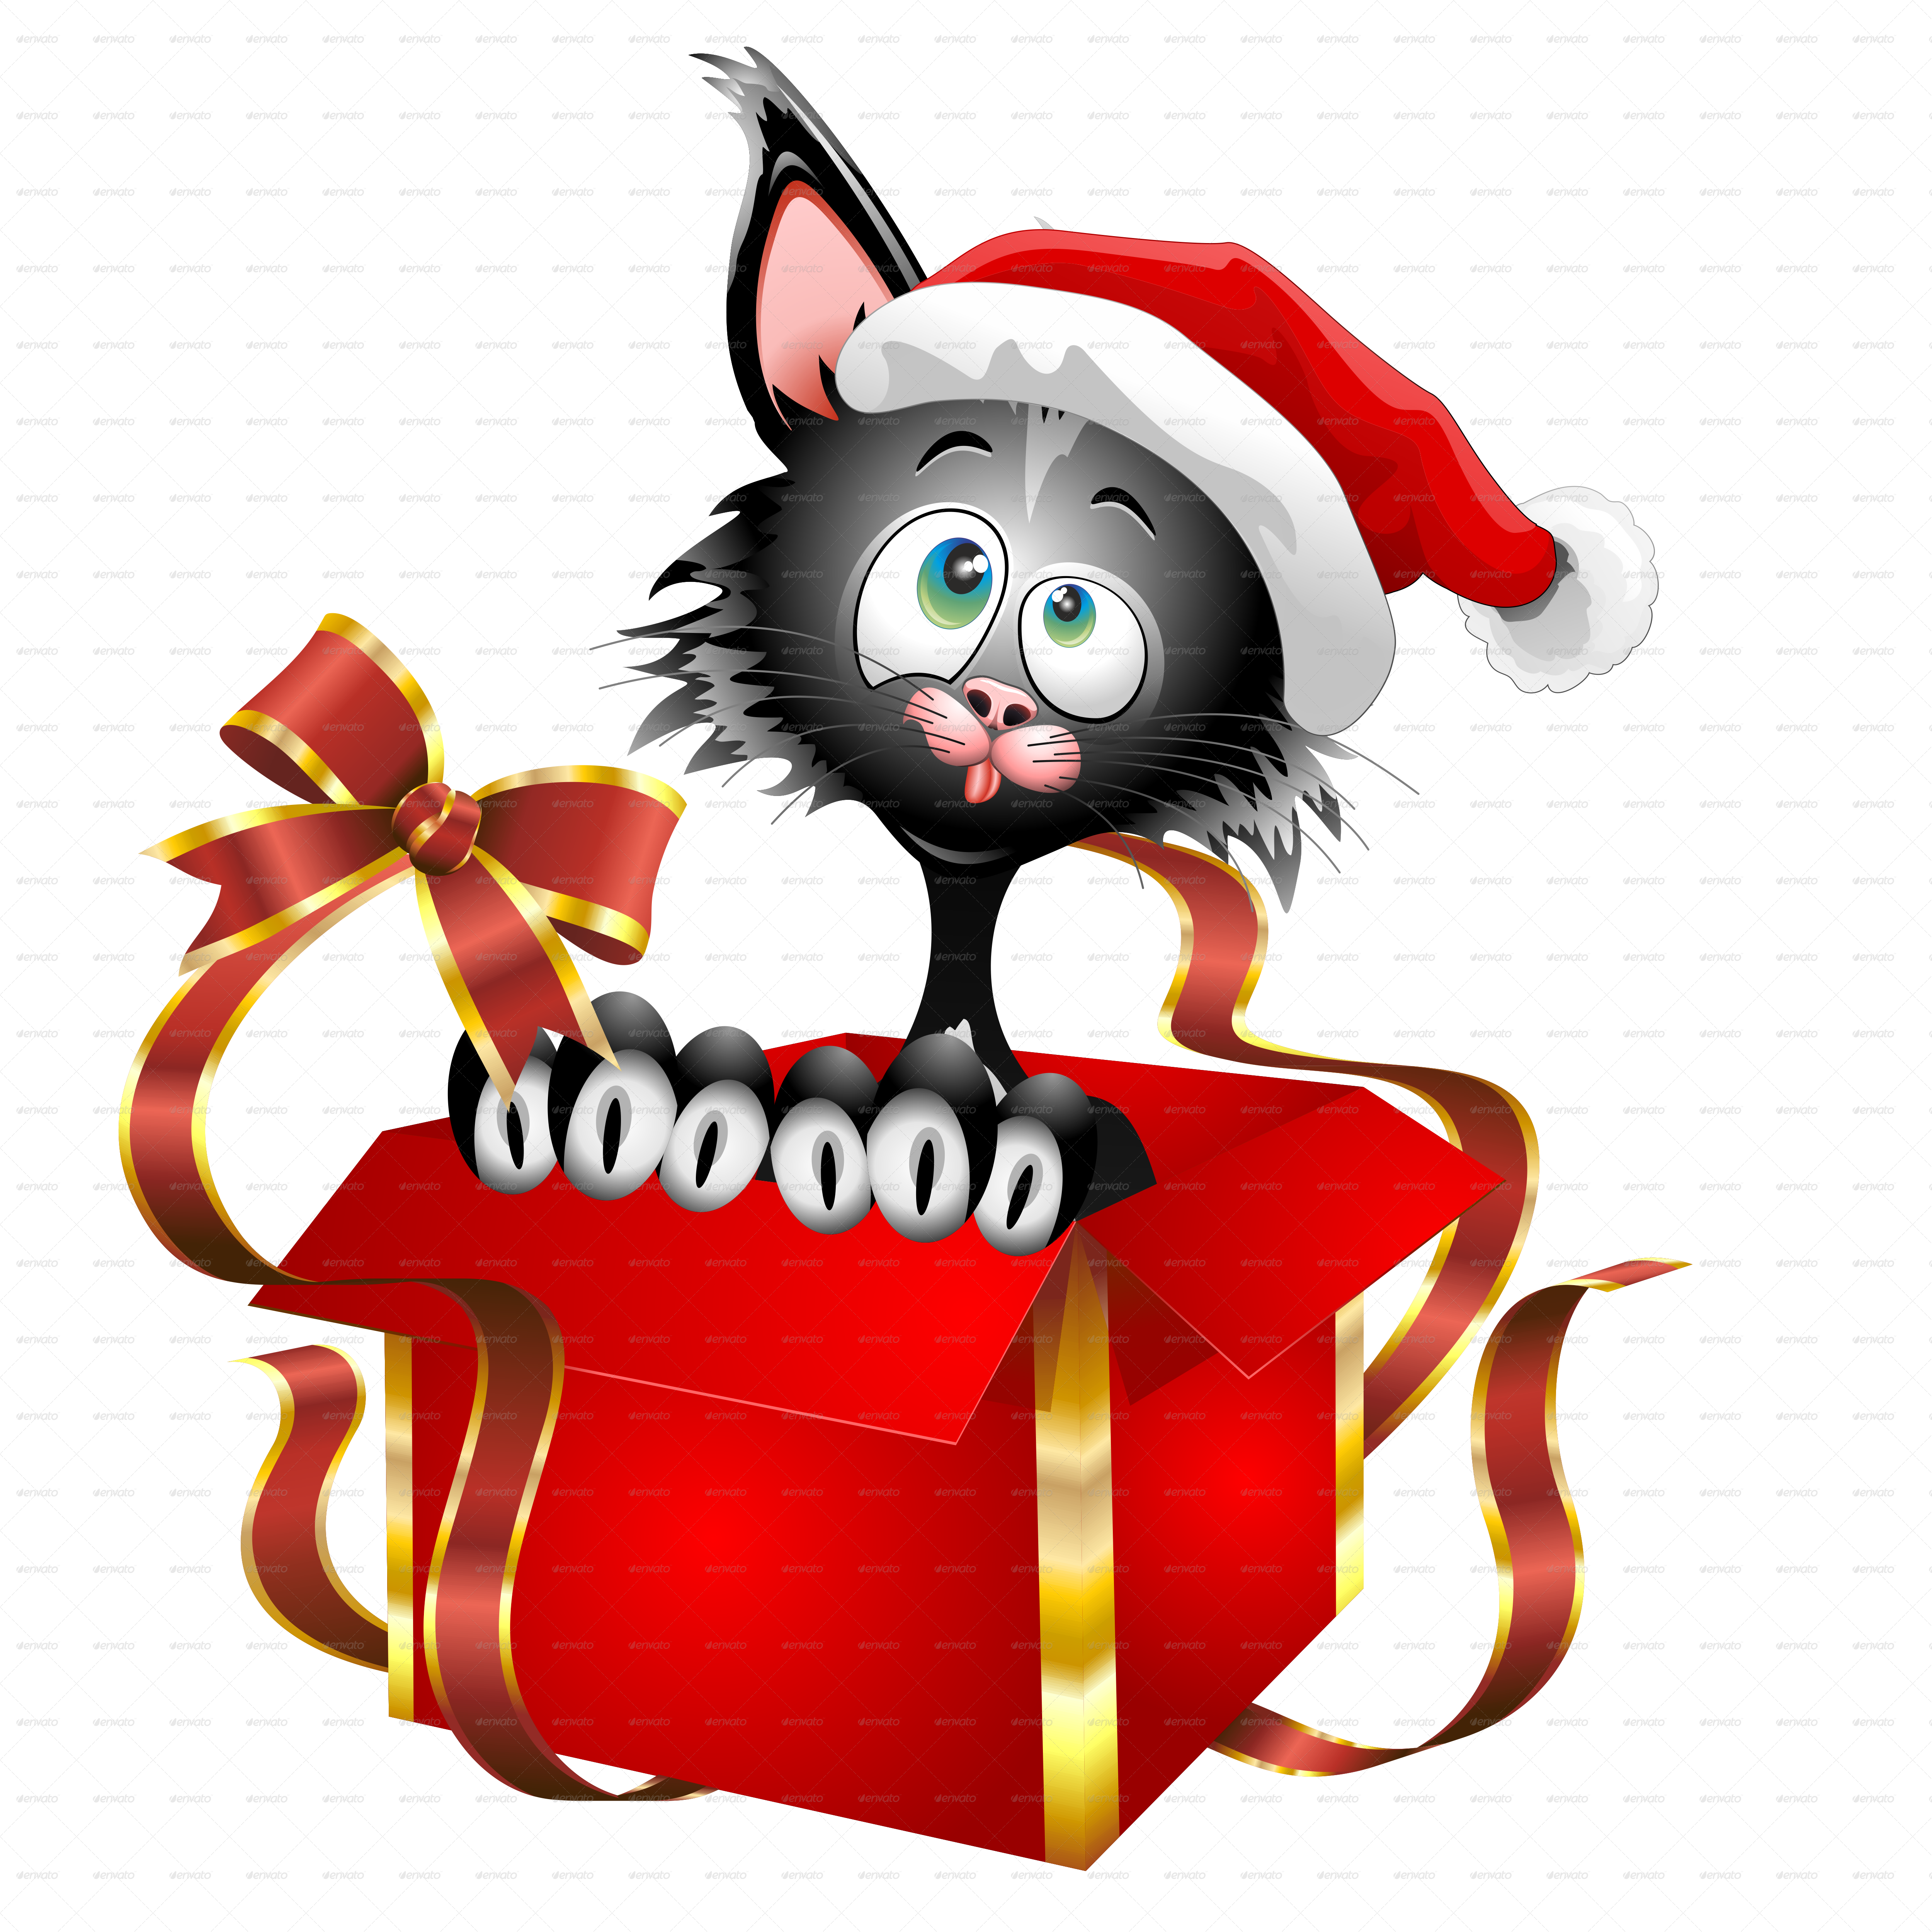 Cat Cartoon on Christmas Gift by Bluedarkat | GraphicRiver